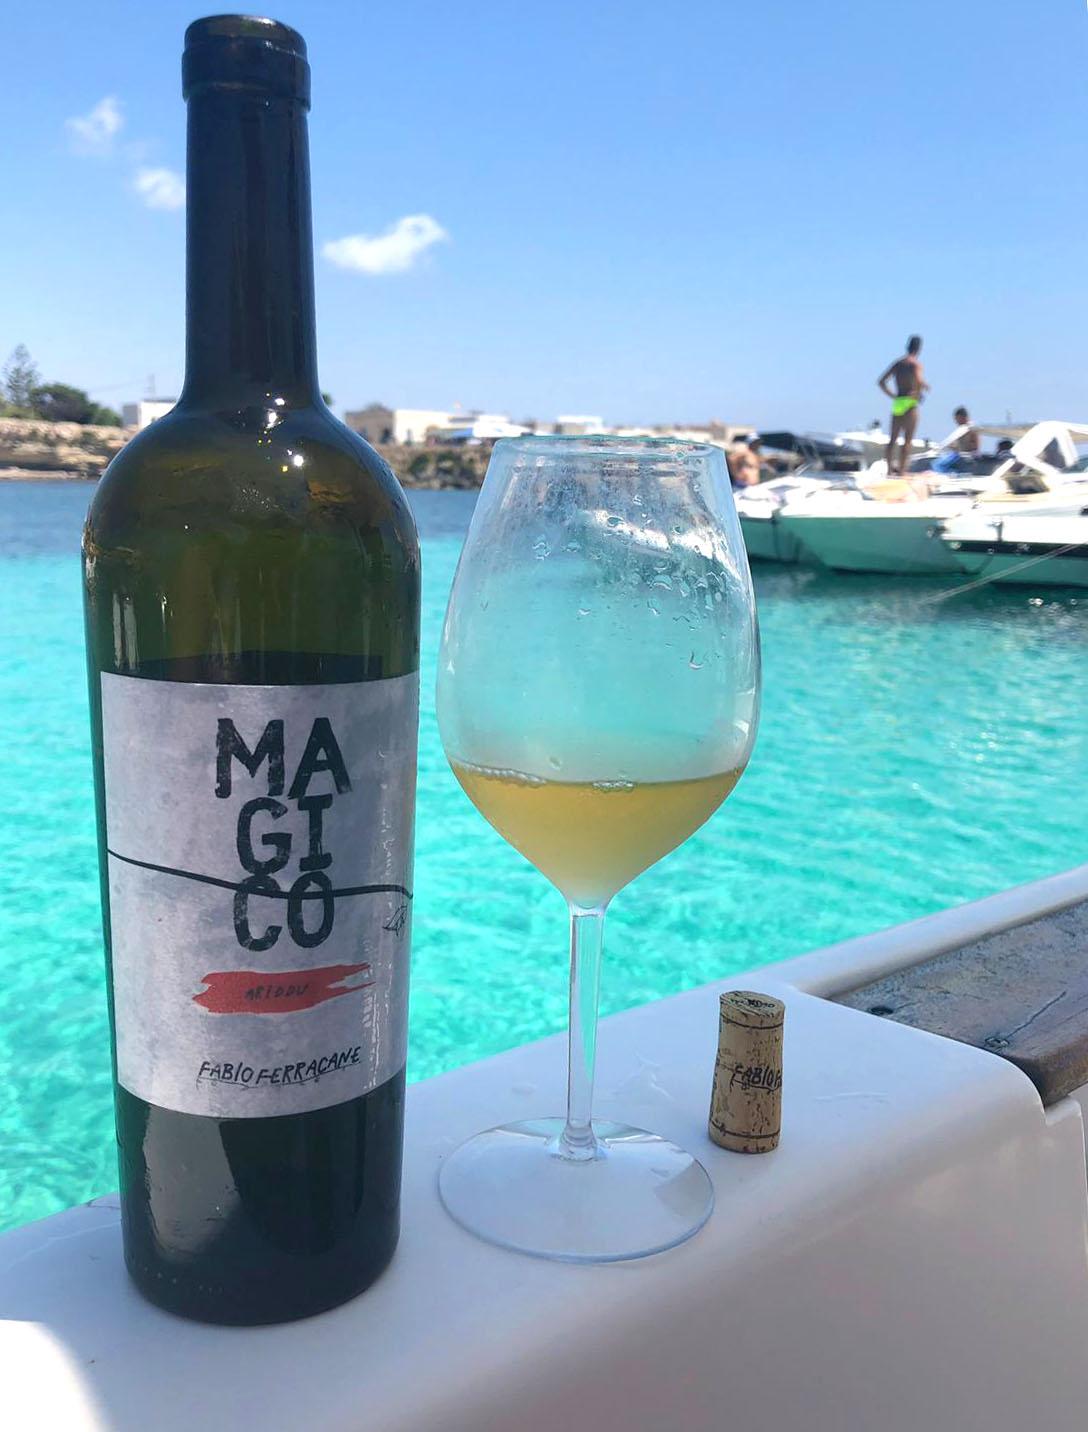 vini bianchi siciliani estate ferracane